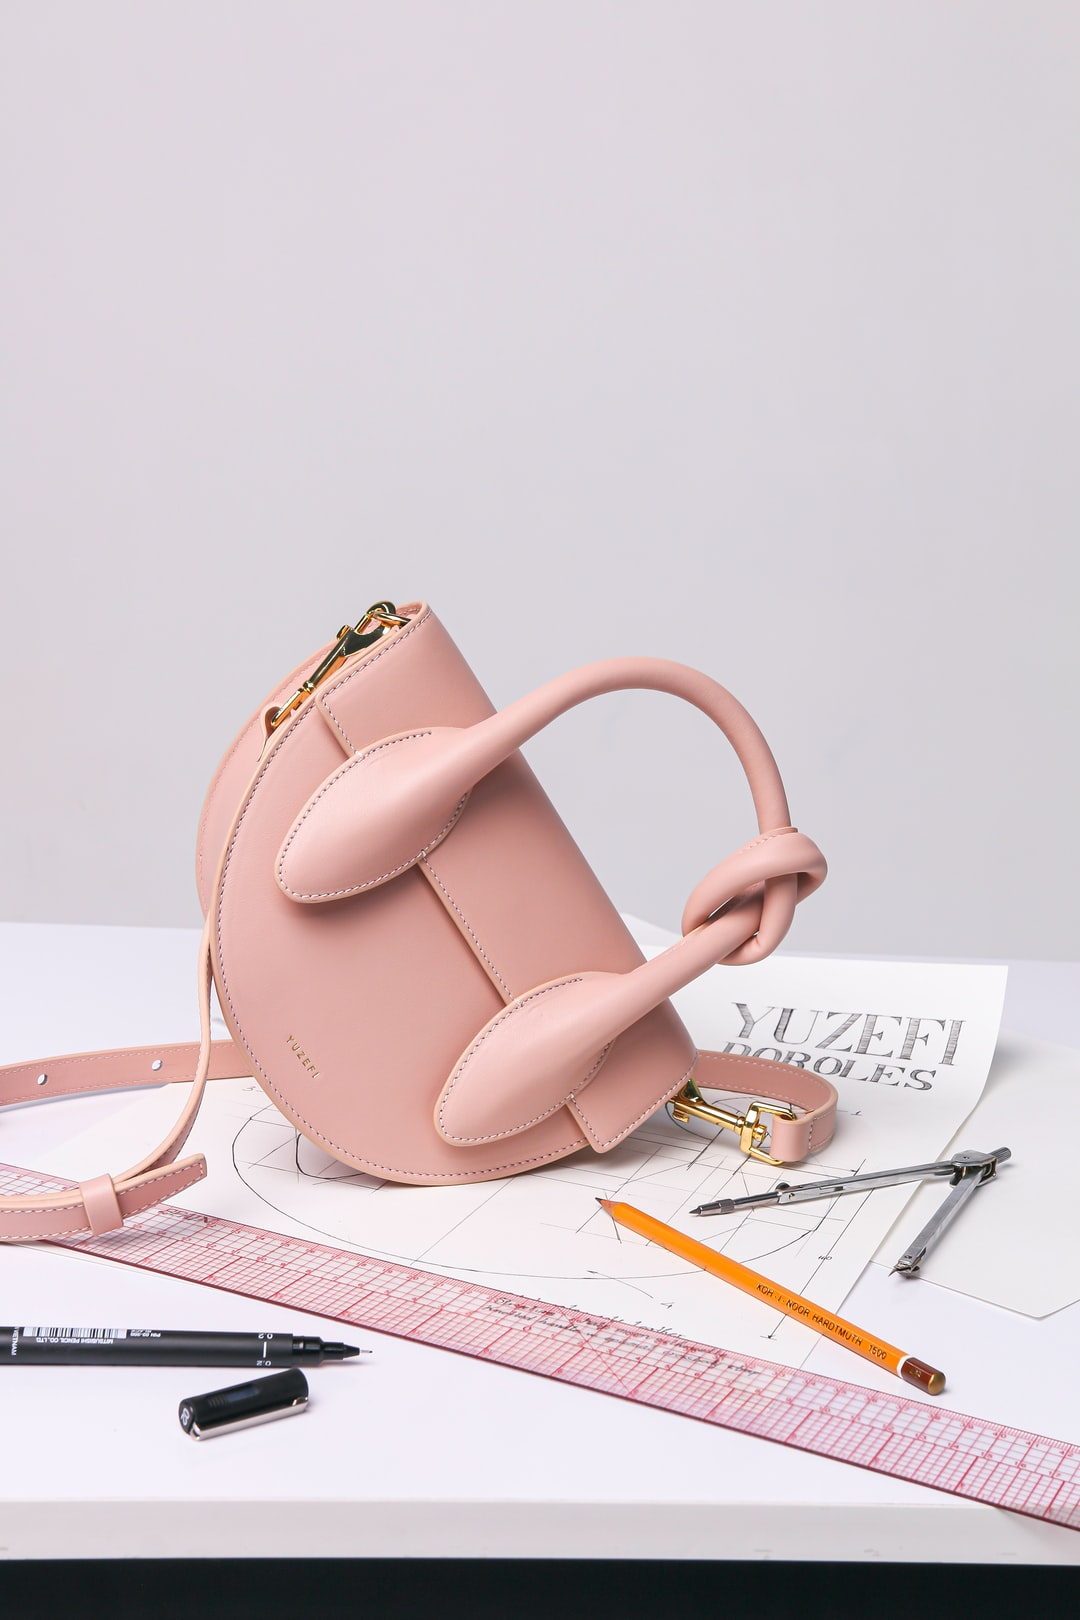 #fashion #bag #minimal #minimalist #minimalism #danselente #pop #concept #minibag #fashionista #accessories